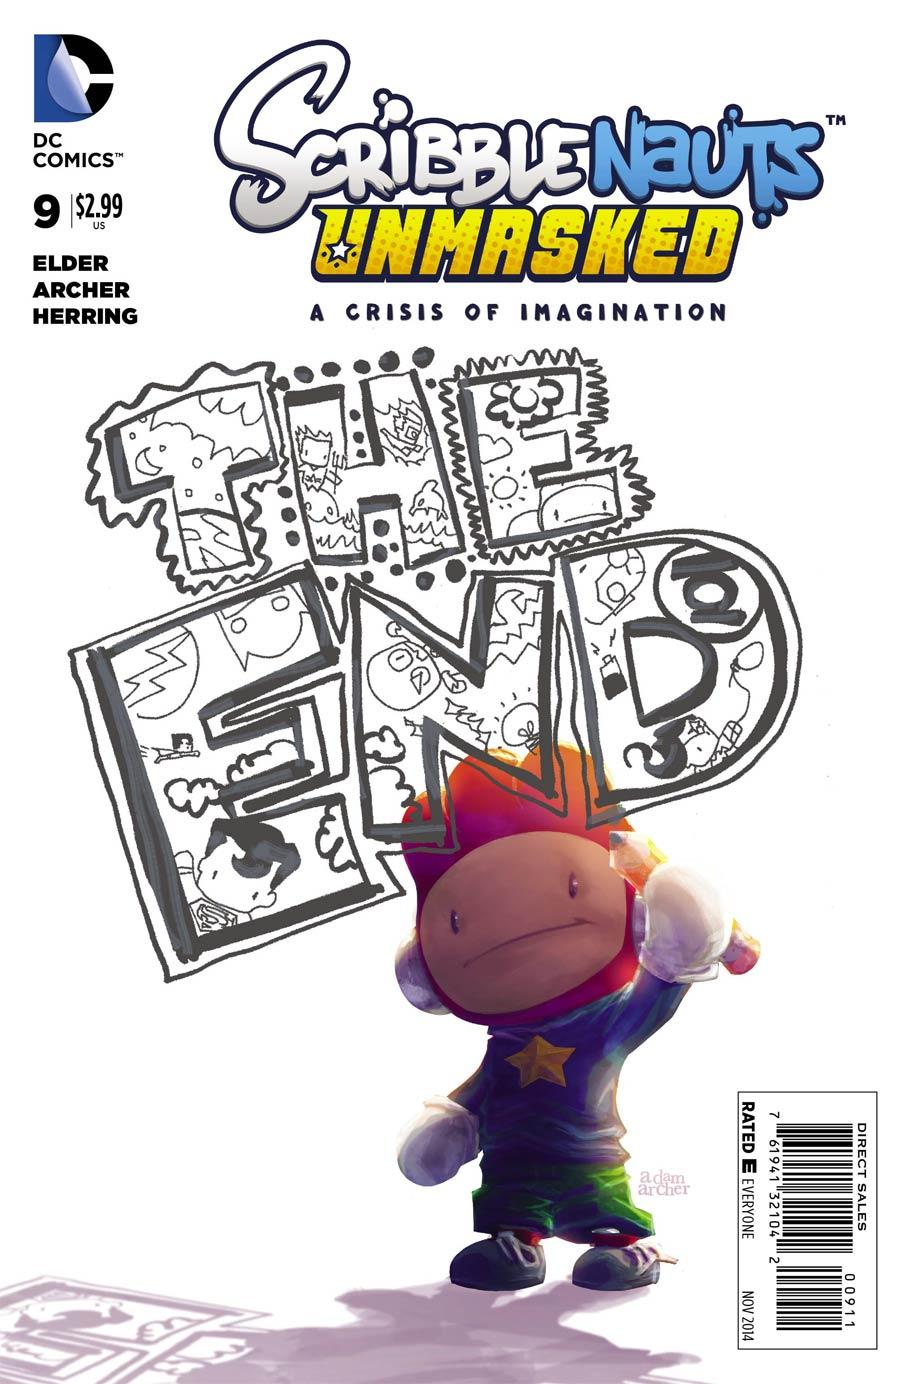 Scribblenauts Unmasked Crisis Of Imagination #9